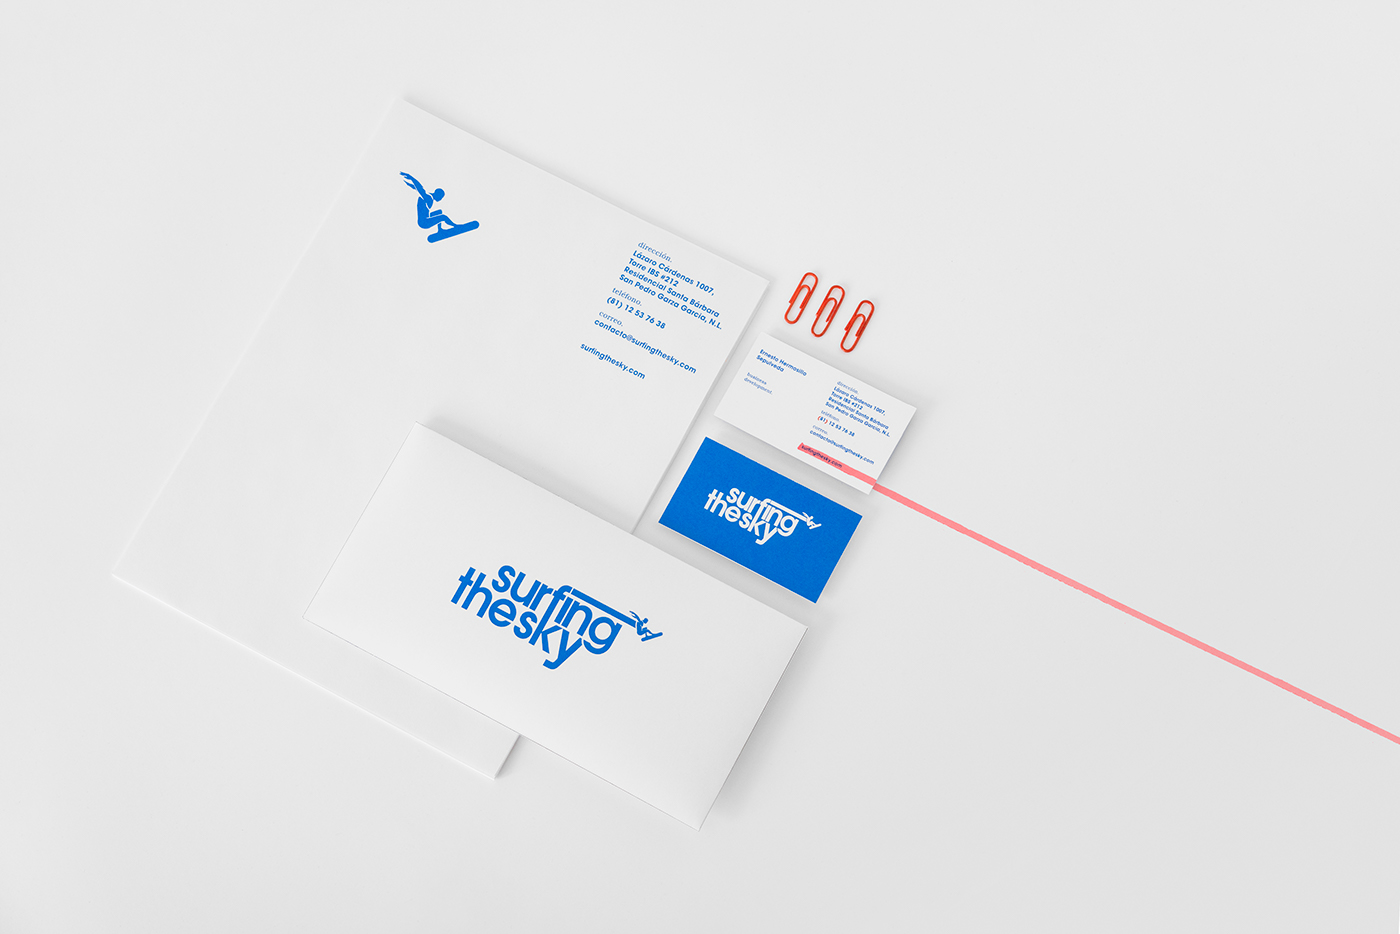 blue medic clean Solution Surf kit pills stationary minimal chrome